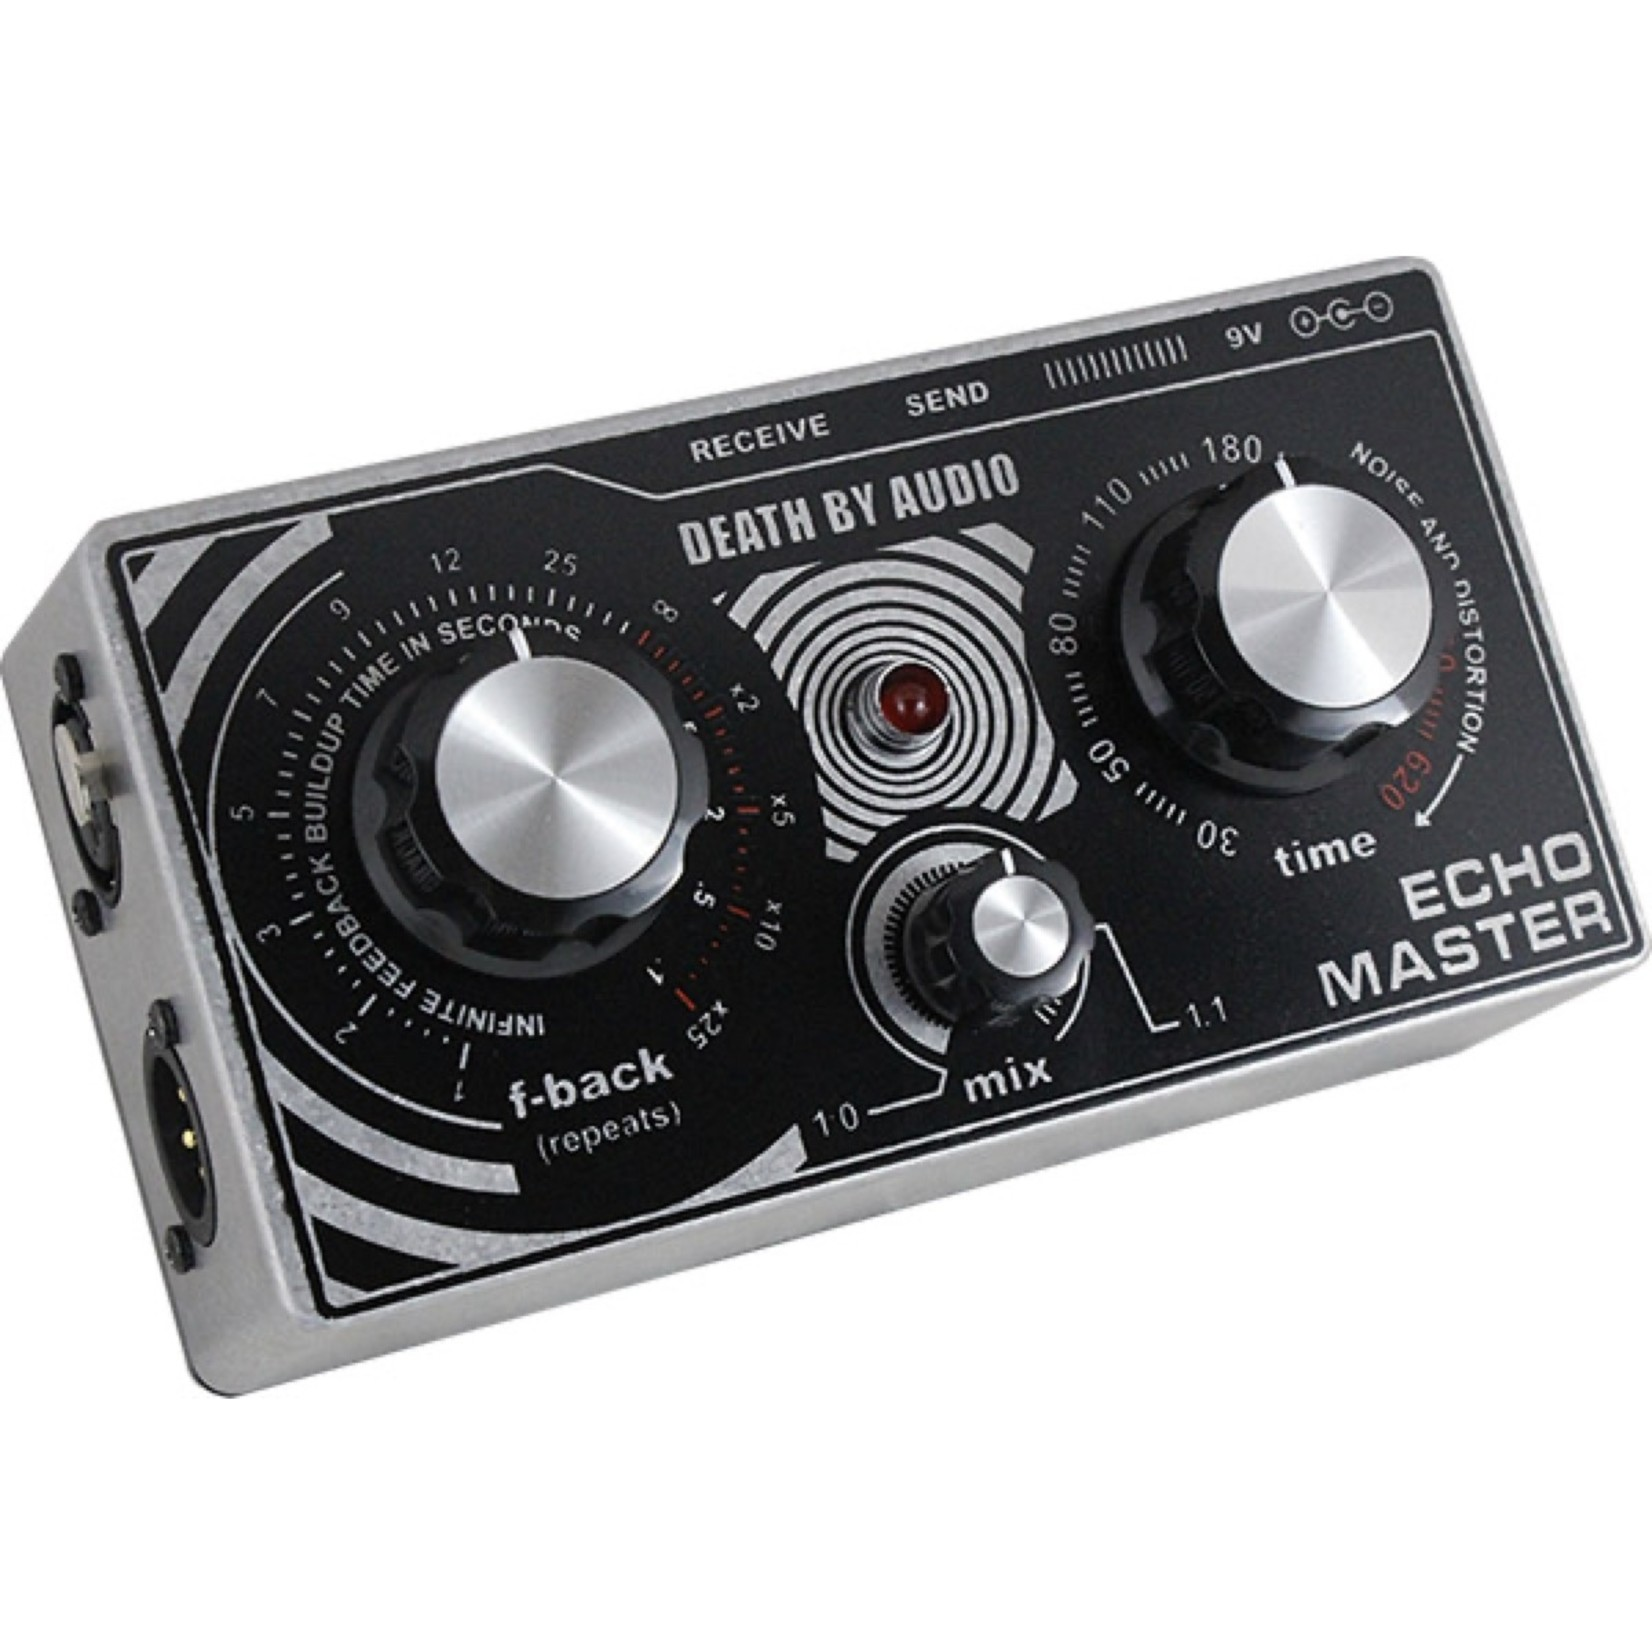 Death By Audio Death By Audio Echo Master, Incredible Vocal Delay Unit